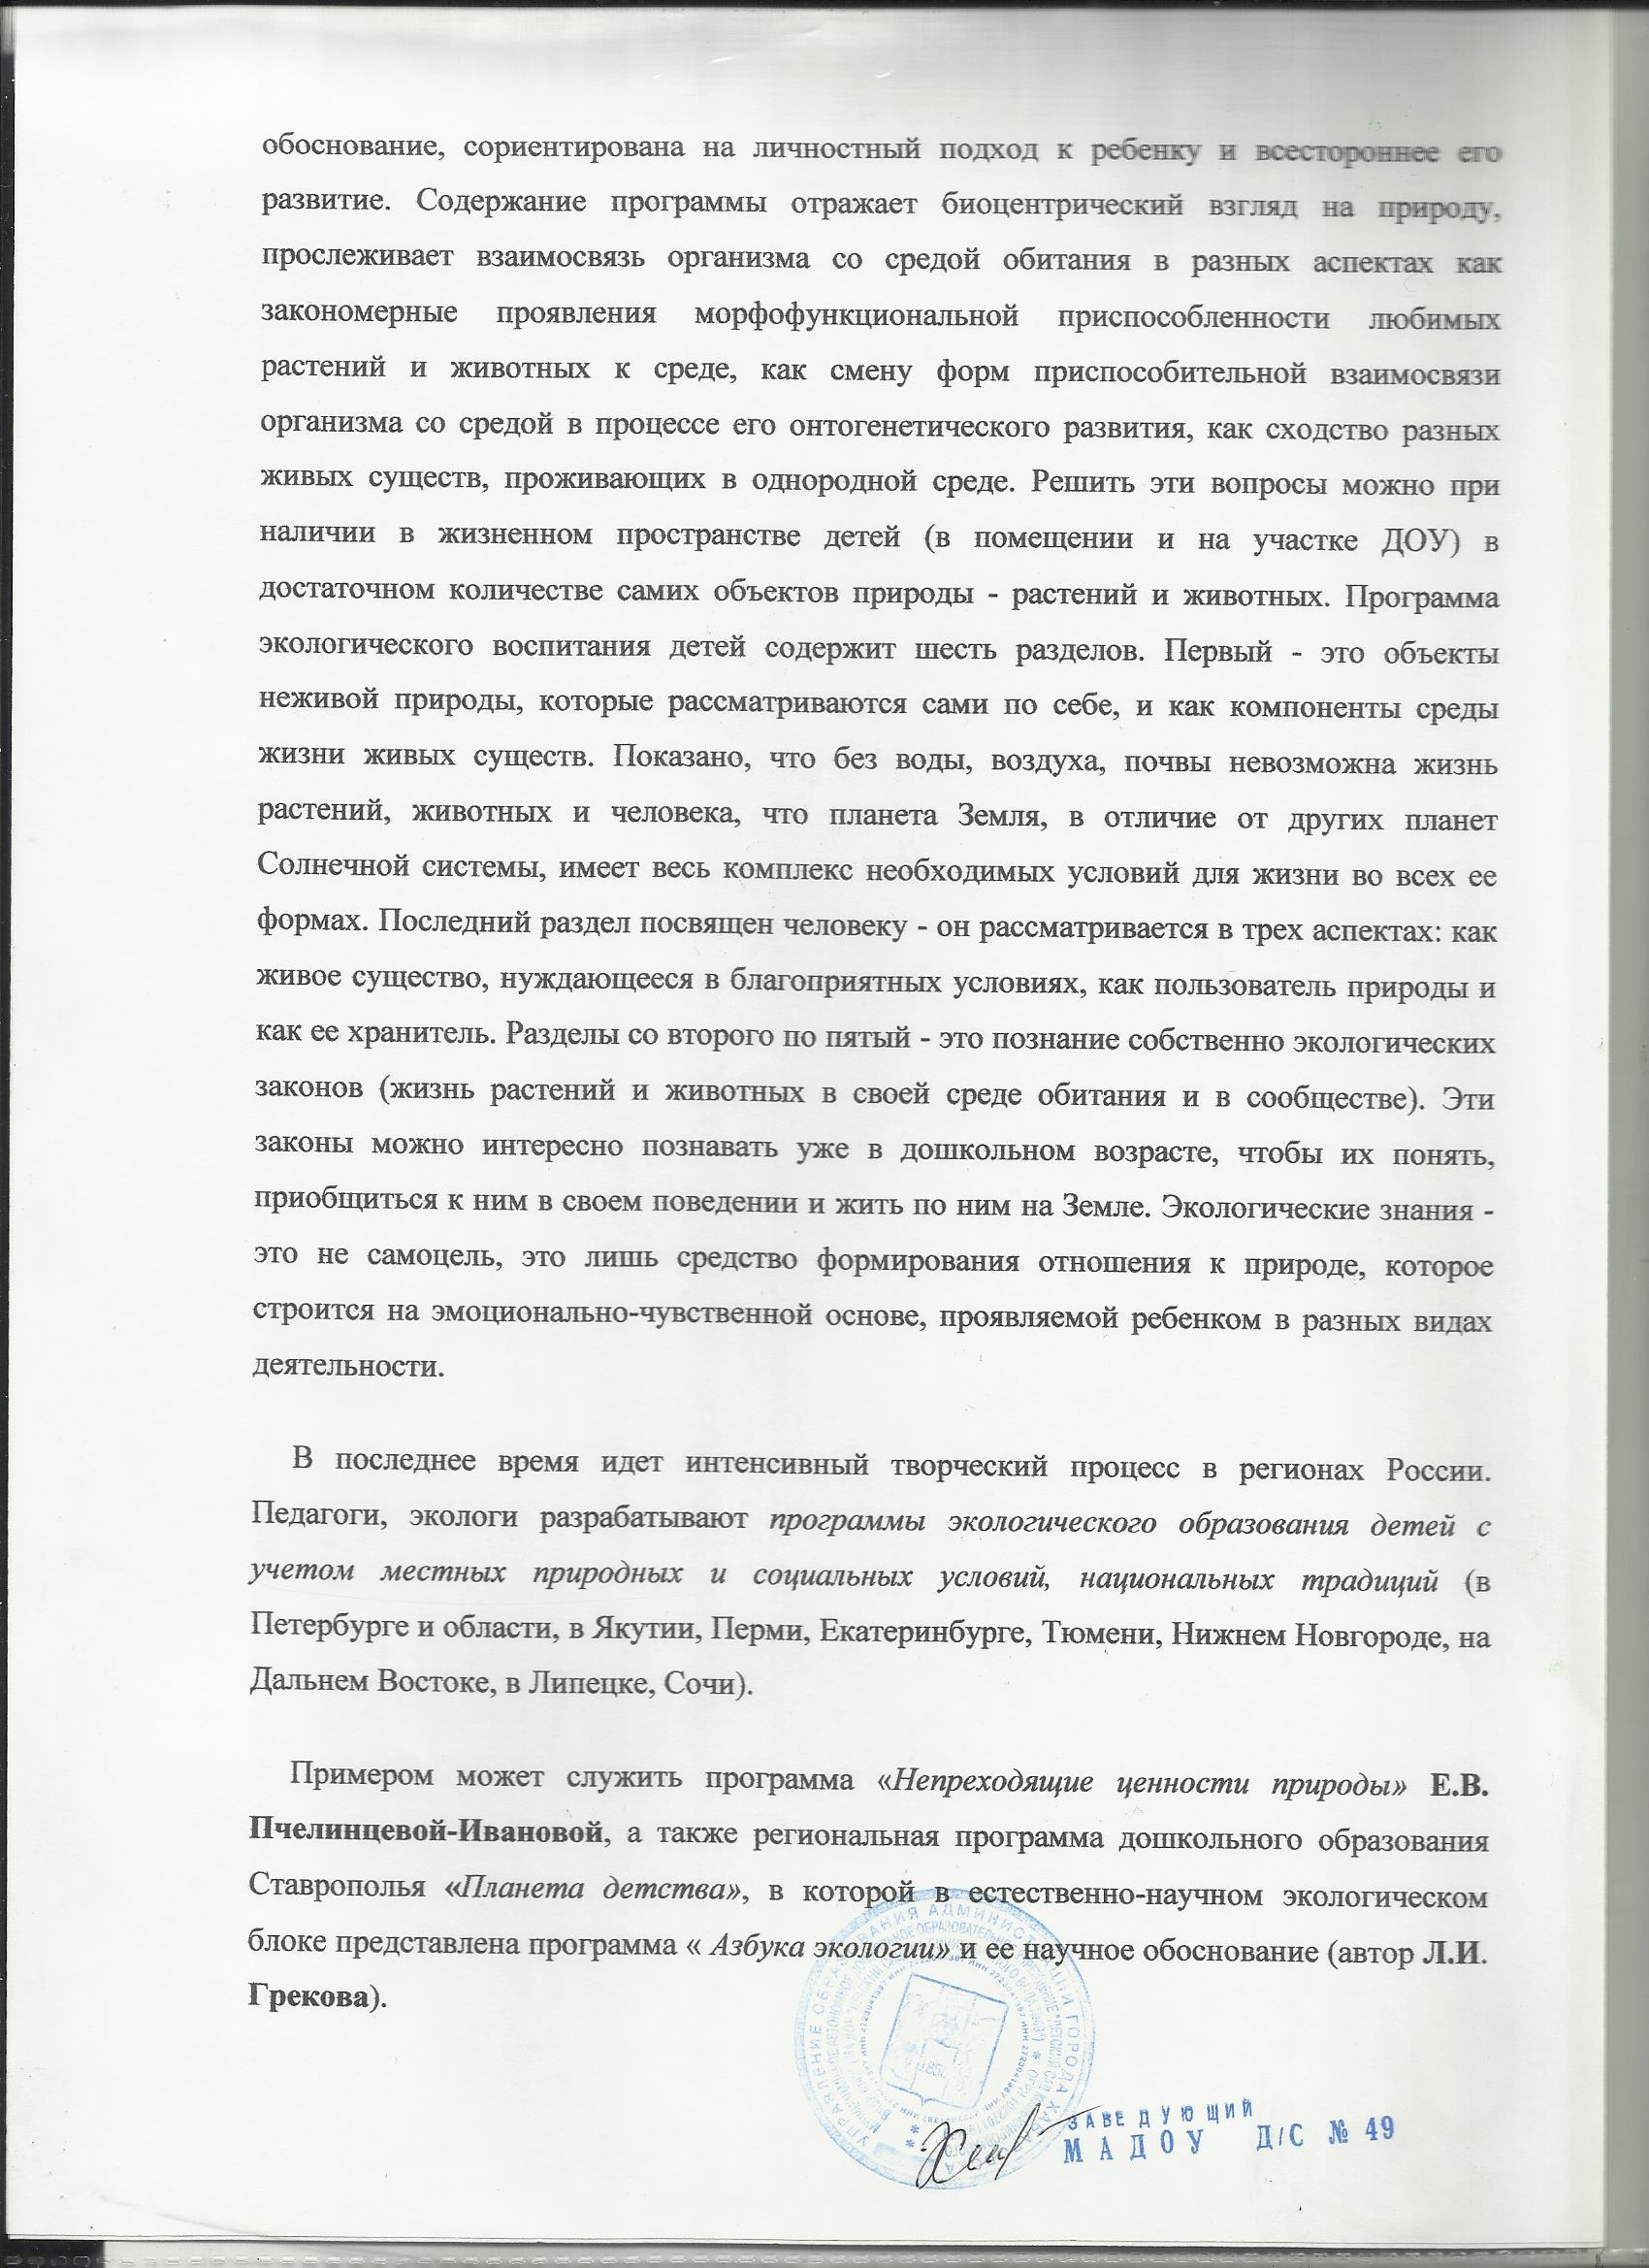 C:\Users\Я\Desktop\004.jpg